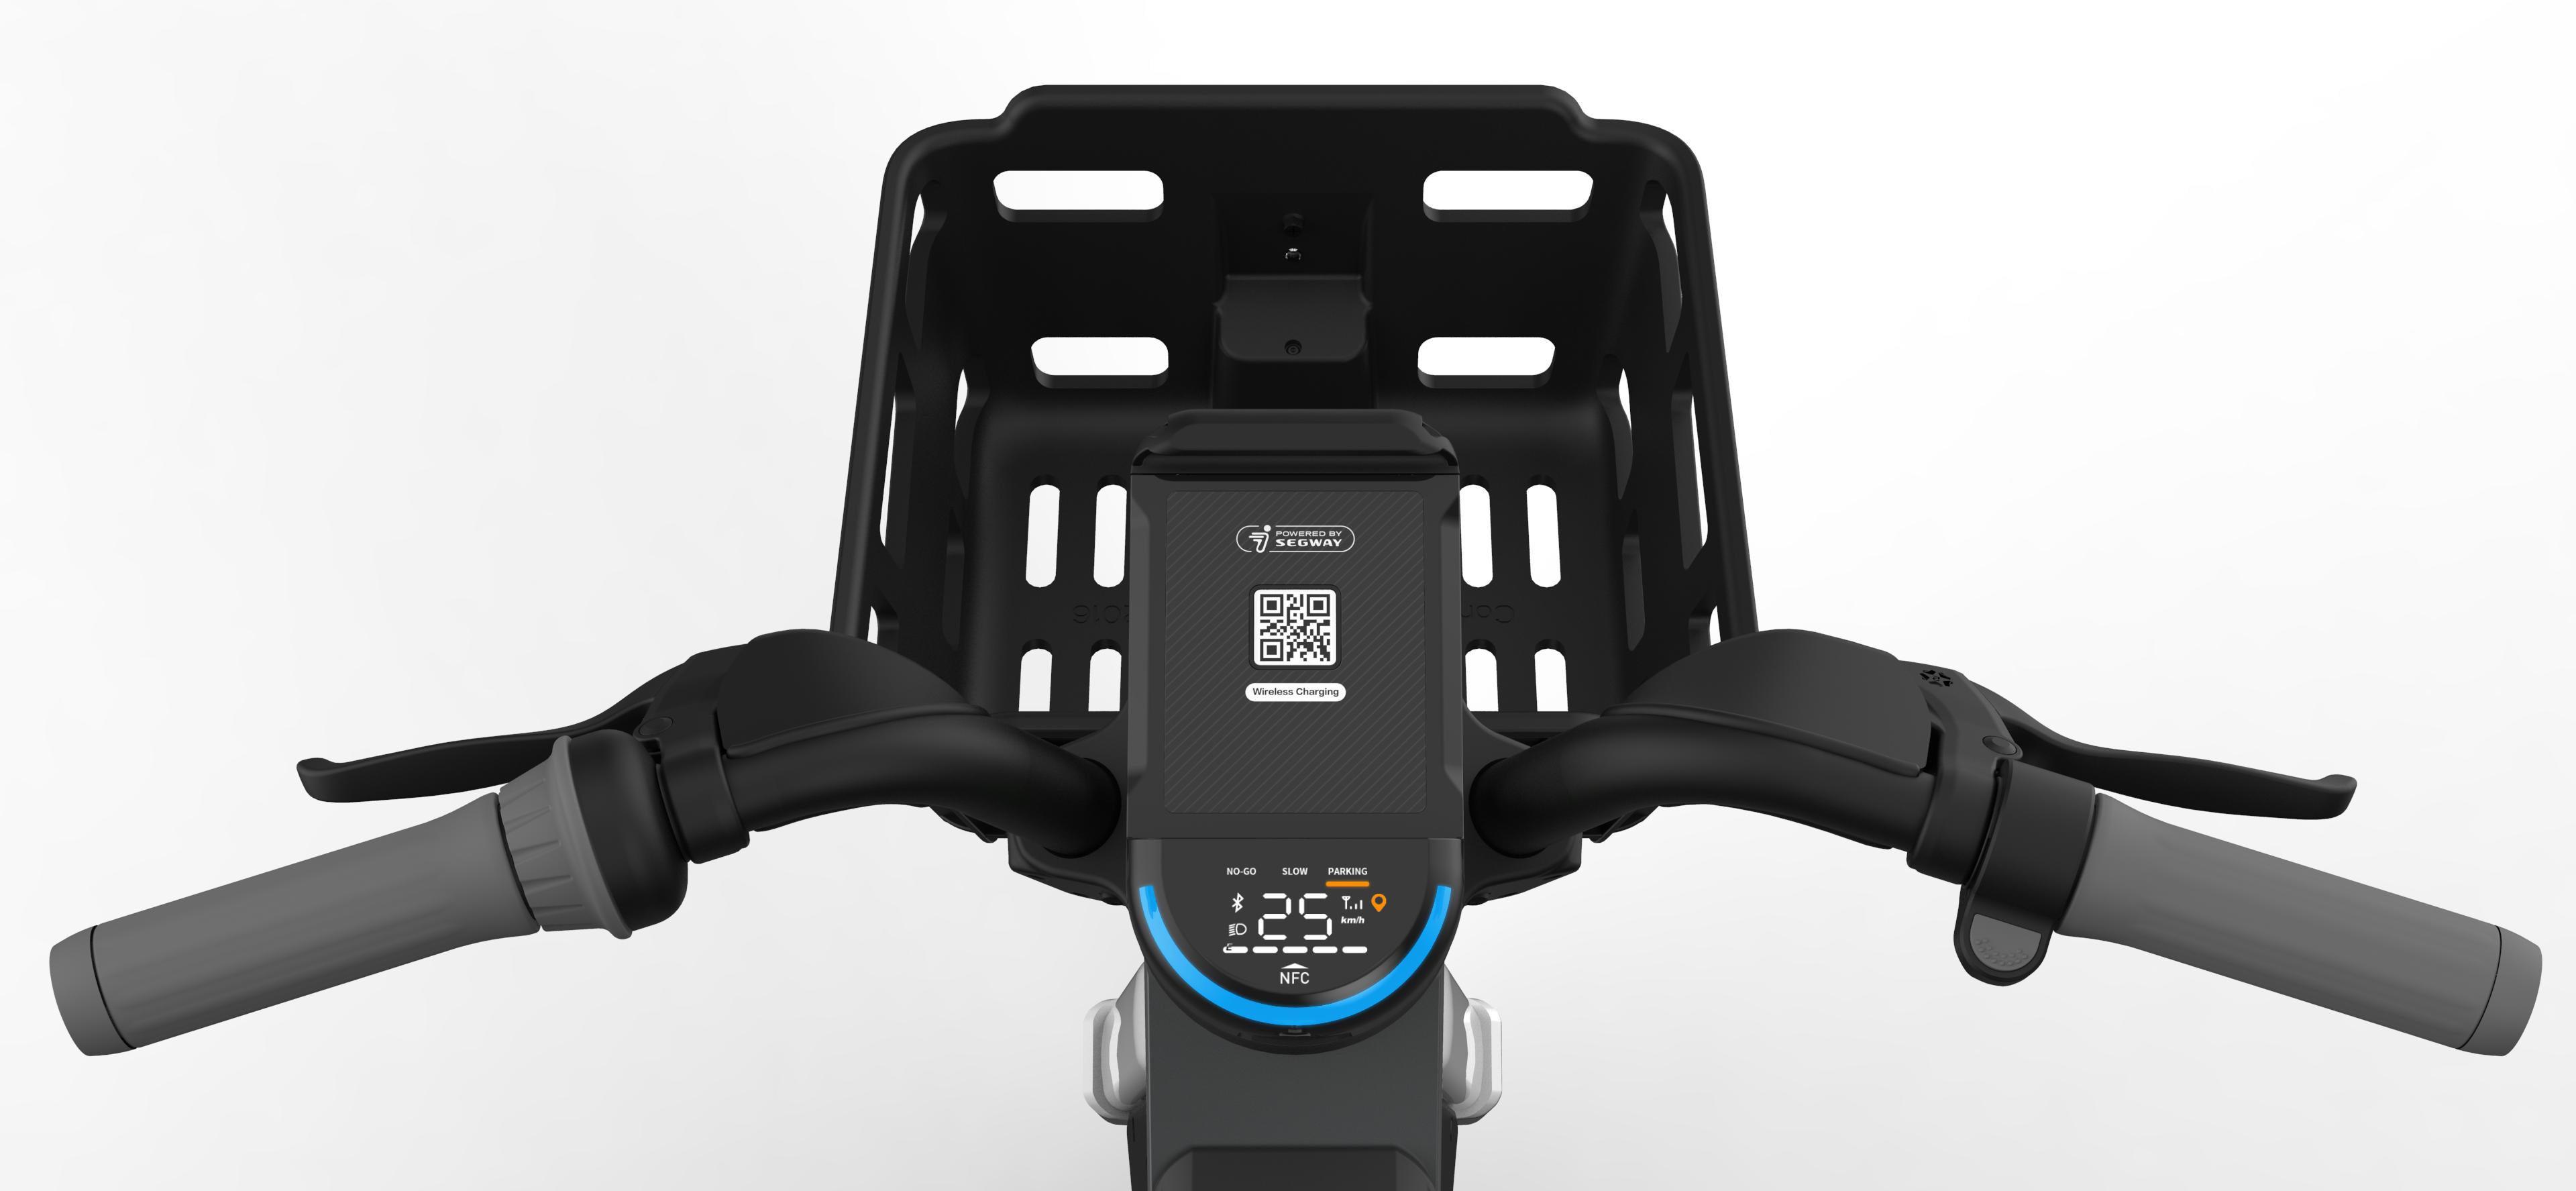 Segway e-bike smart dashboard